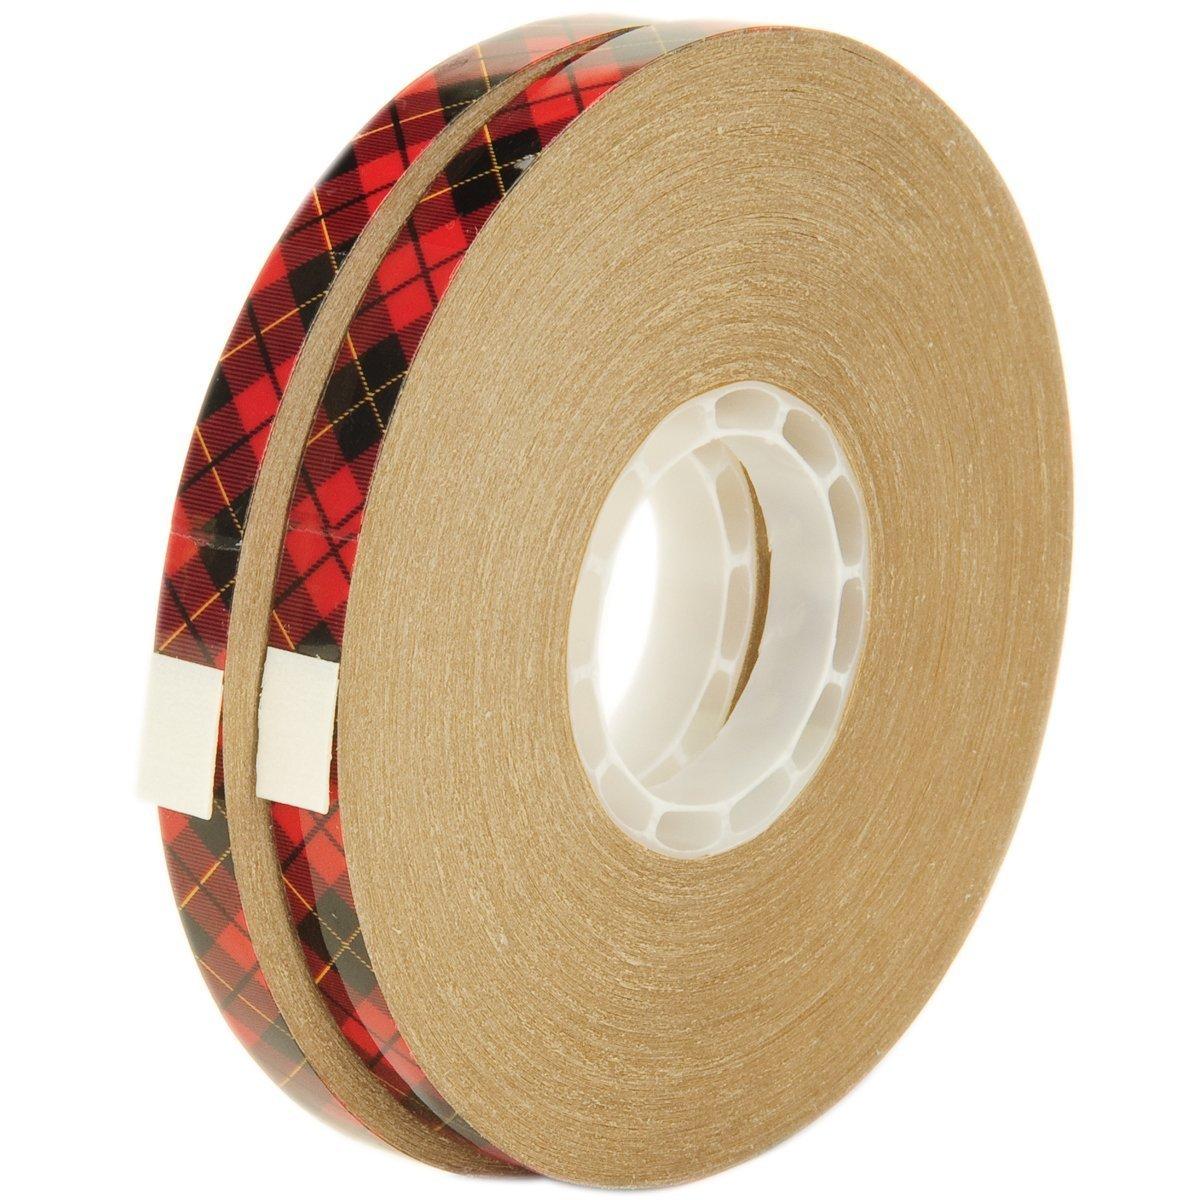 Scotch 085-R ATG Advanced Tape Glider Refill Rolls, 1/4-Inch by 36-Yard, 2-Rolls/Box, 4-PACK by Scotch Brands